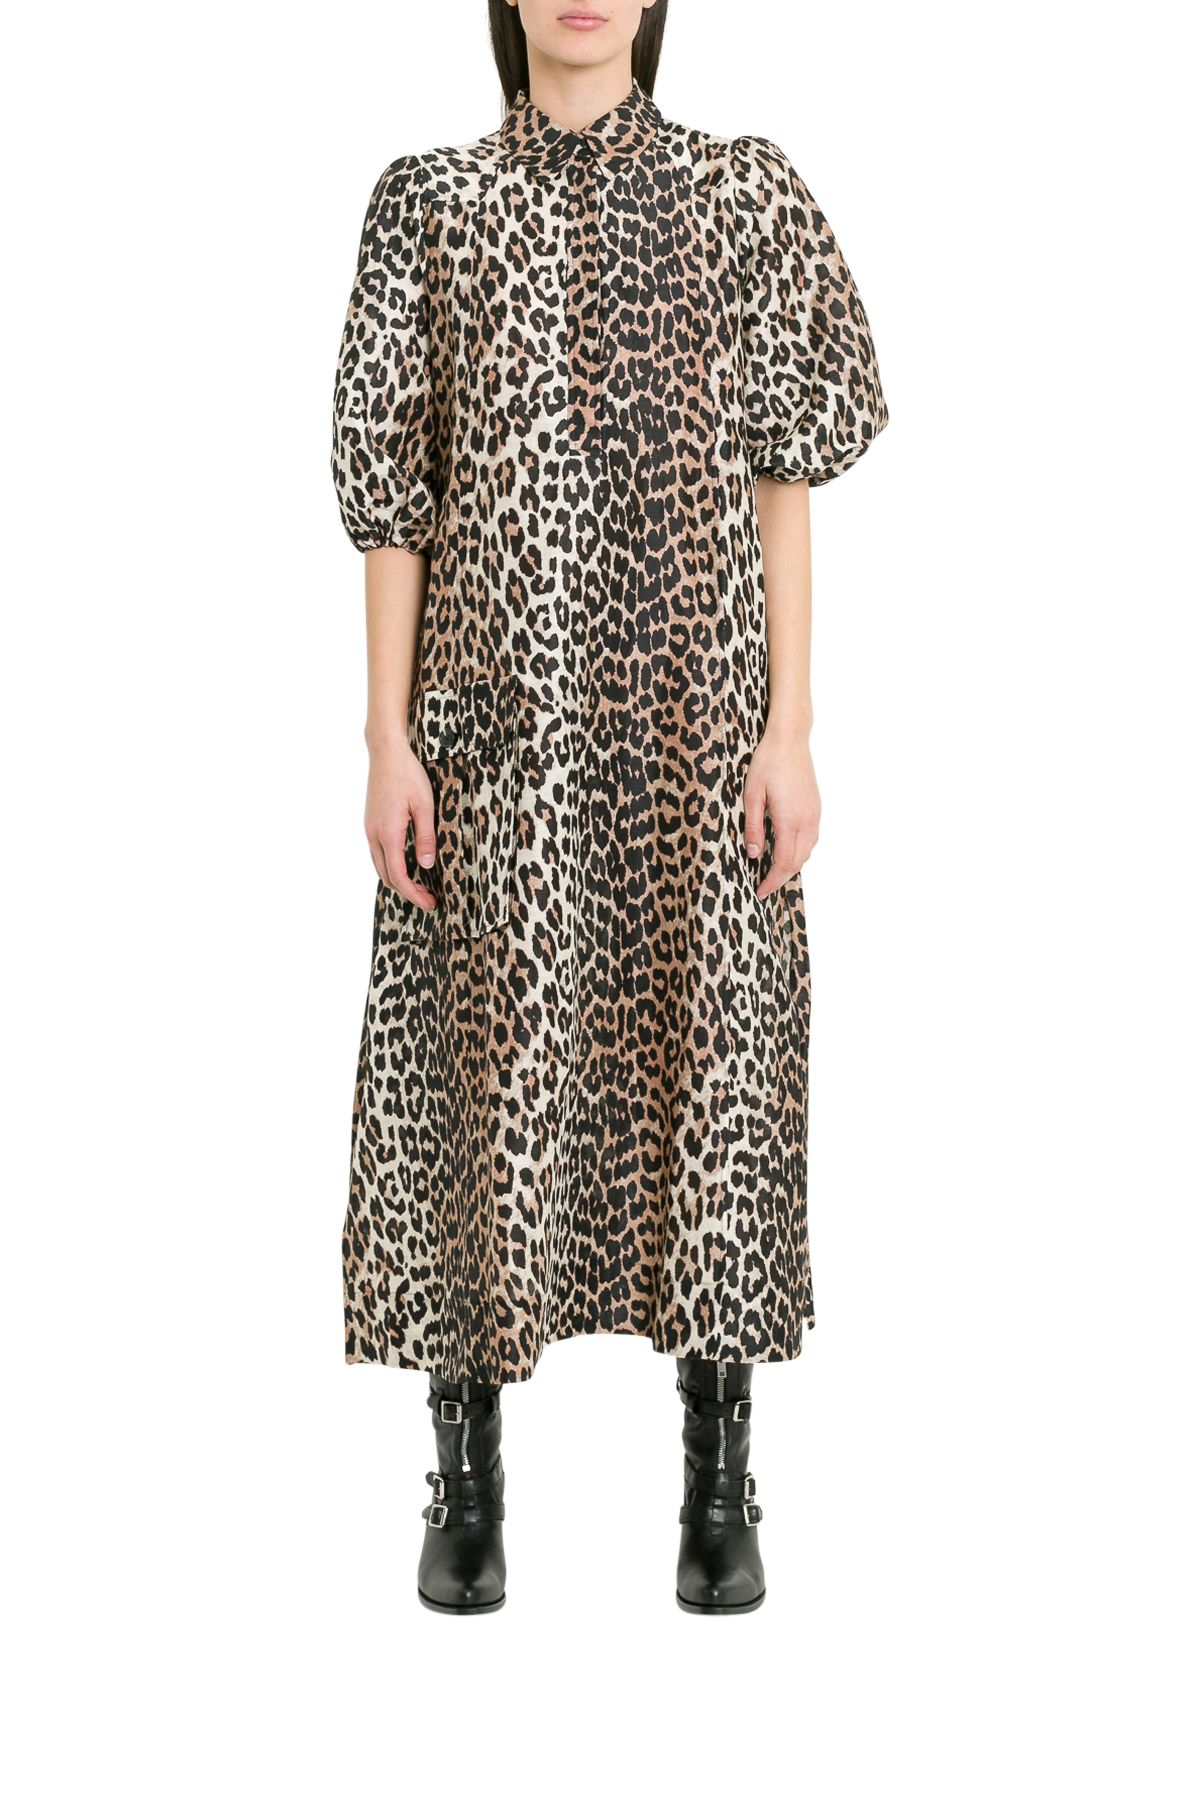 Ganni Dresses CEDAR LEOPARD DRESS